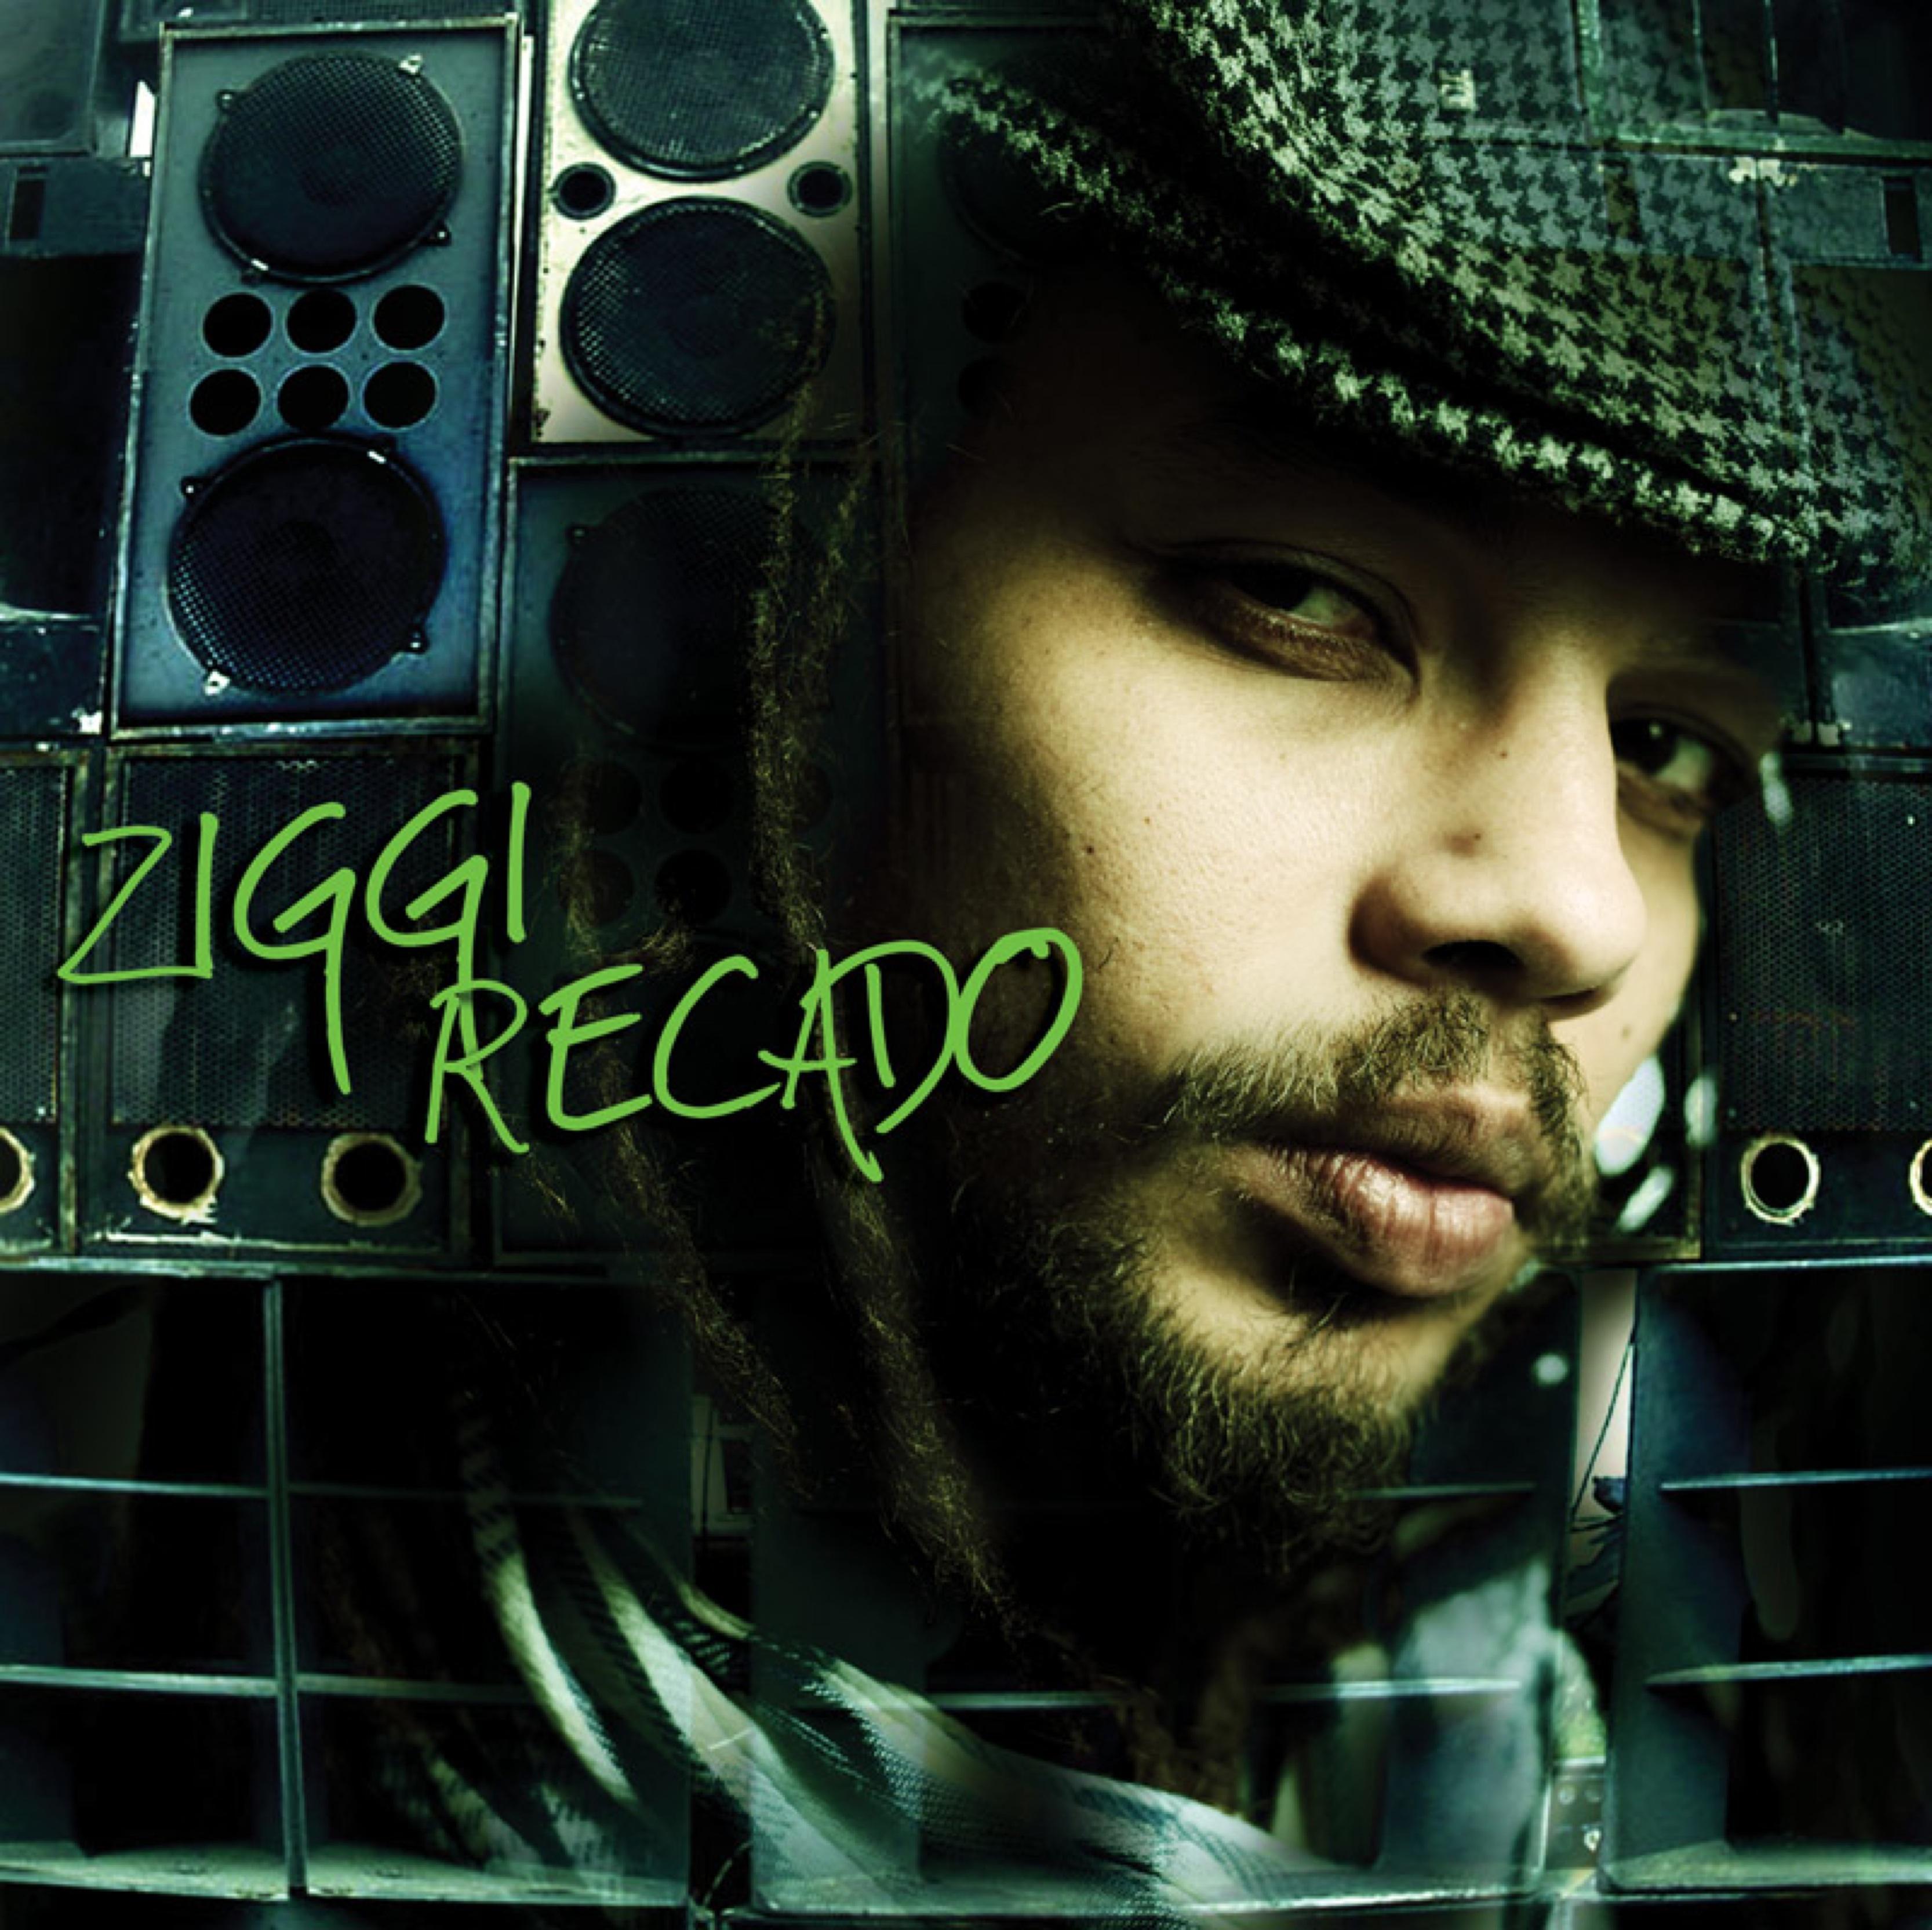 ziggi1